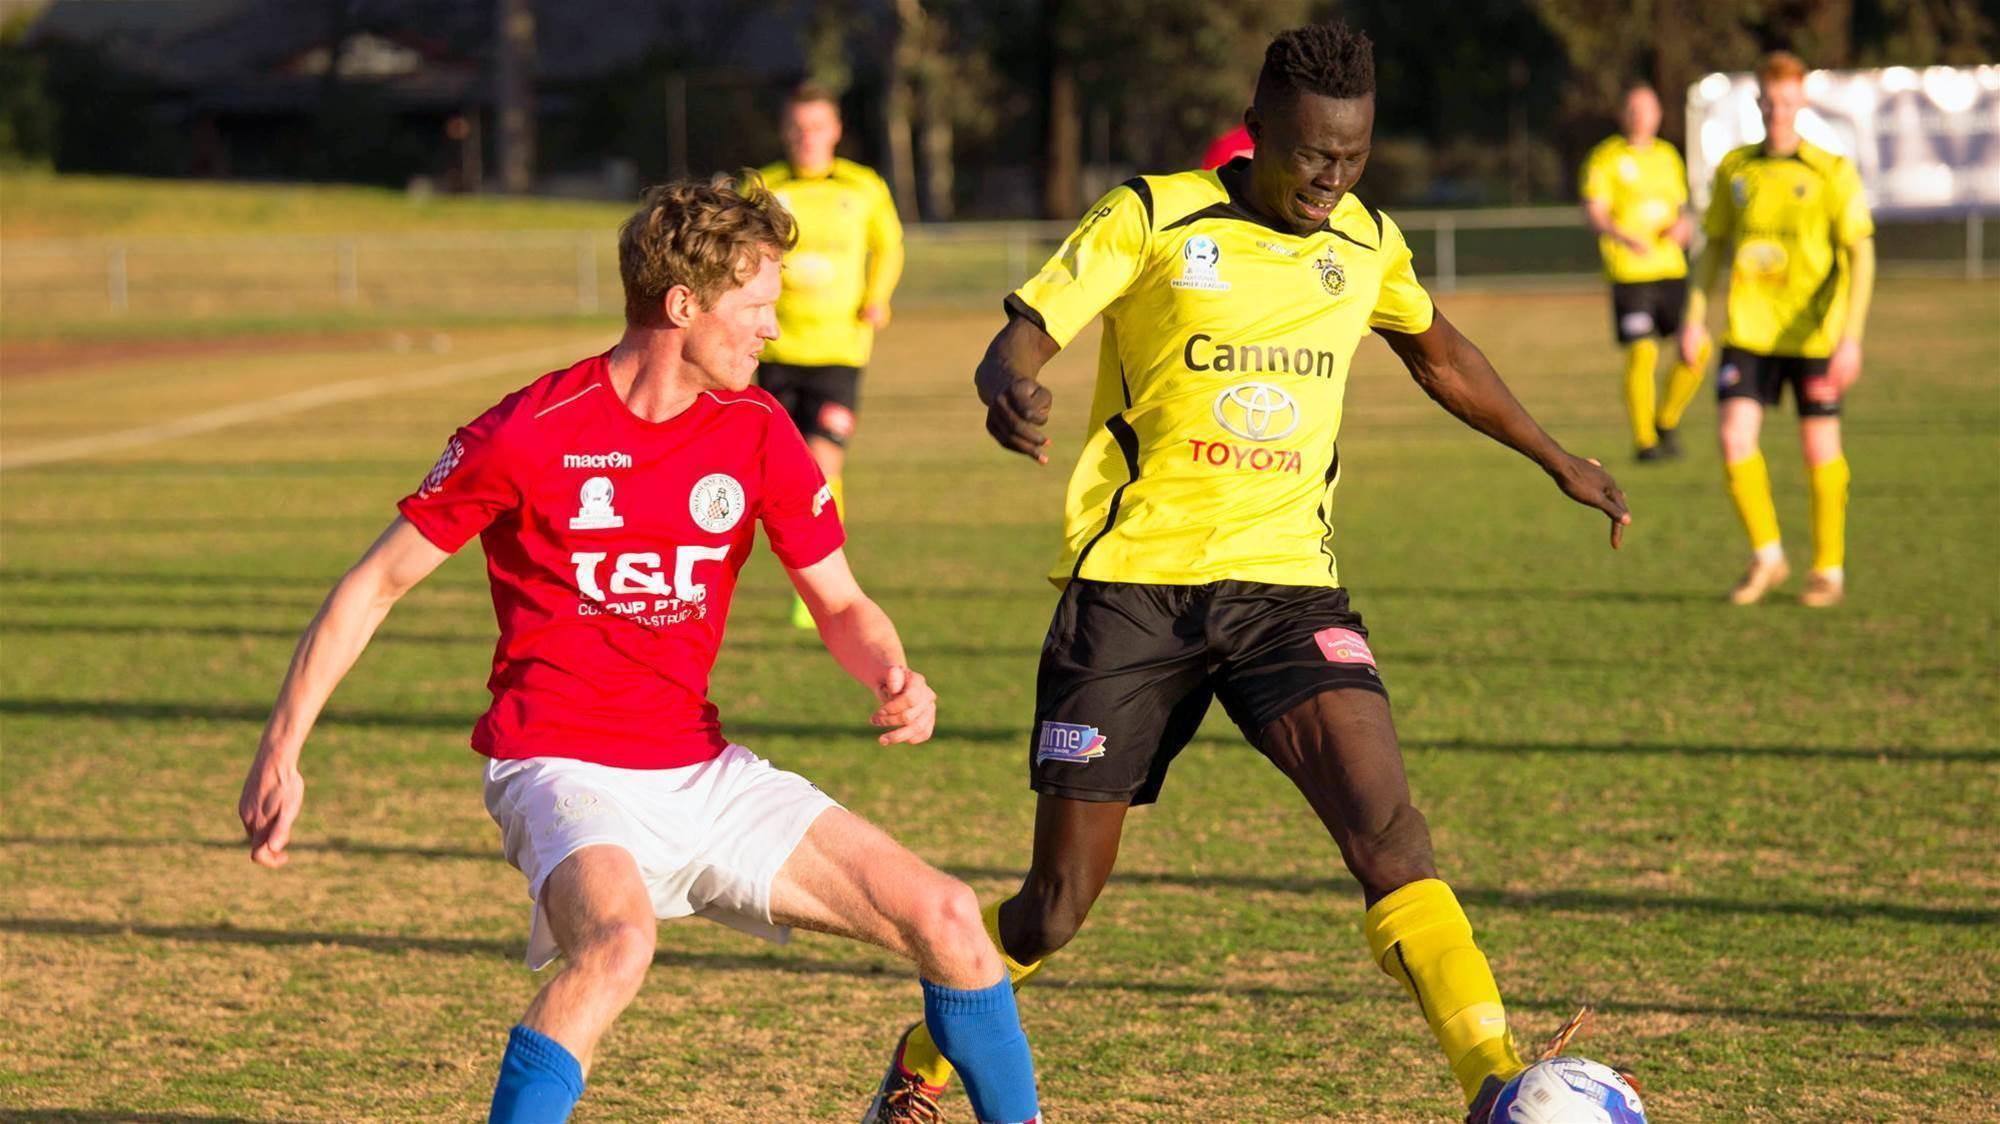 Football needs to embrace ethnicity